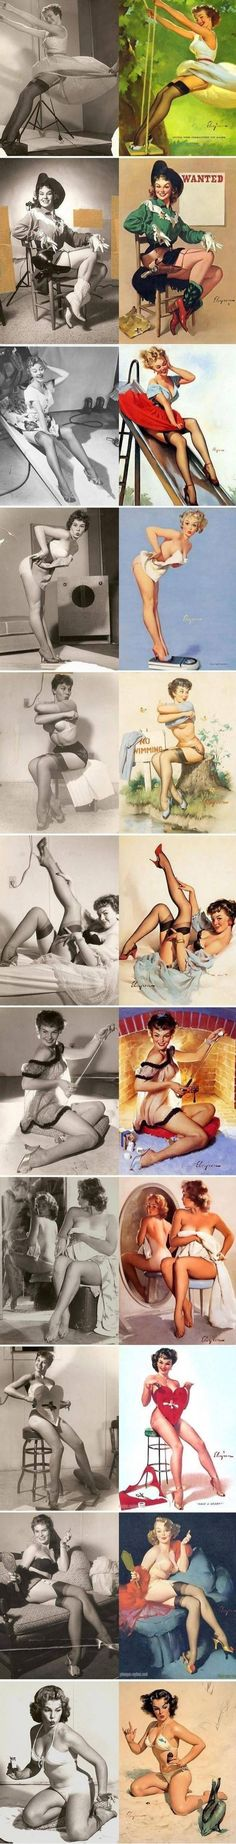 43 Ideas Retro Vintage Art Pin Up Gil Elvgren Vintage Pins, Vintage Art, Vintage Posters, Vintage Woman, Vintage Drawing, Retro Art, Vintage Photos, Model Posing, Color Draw